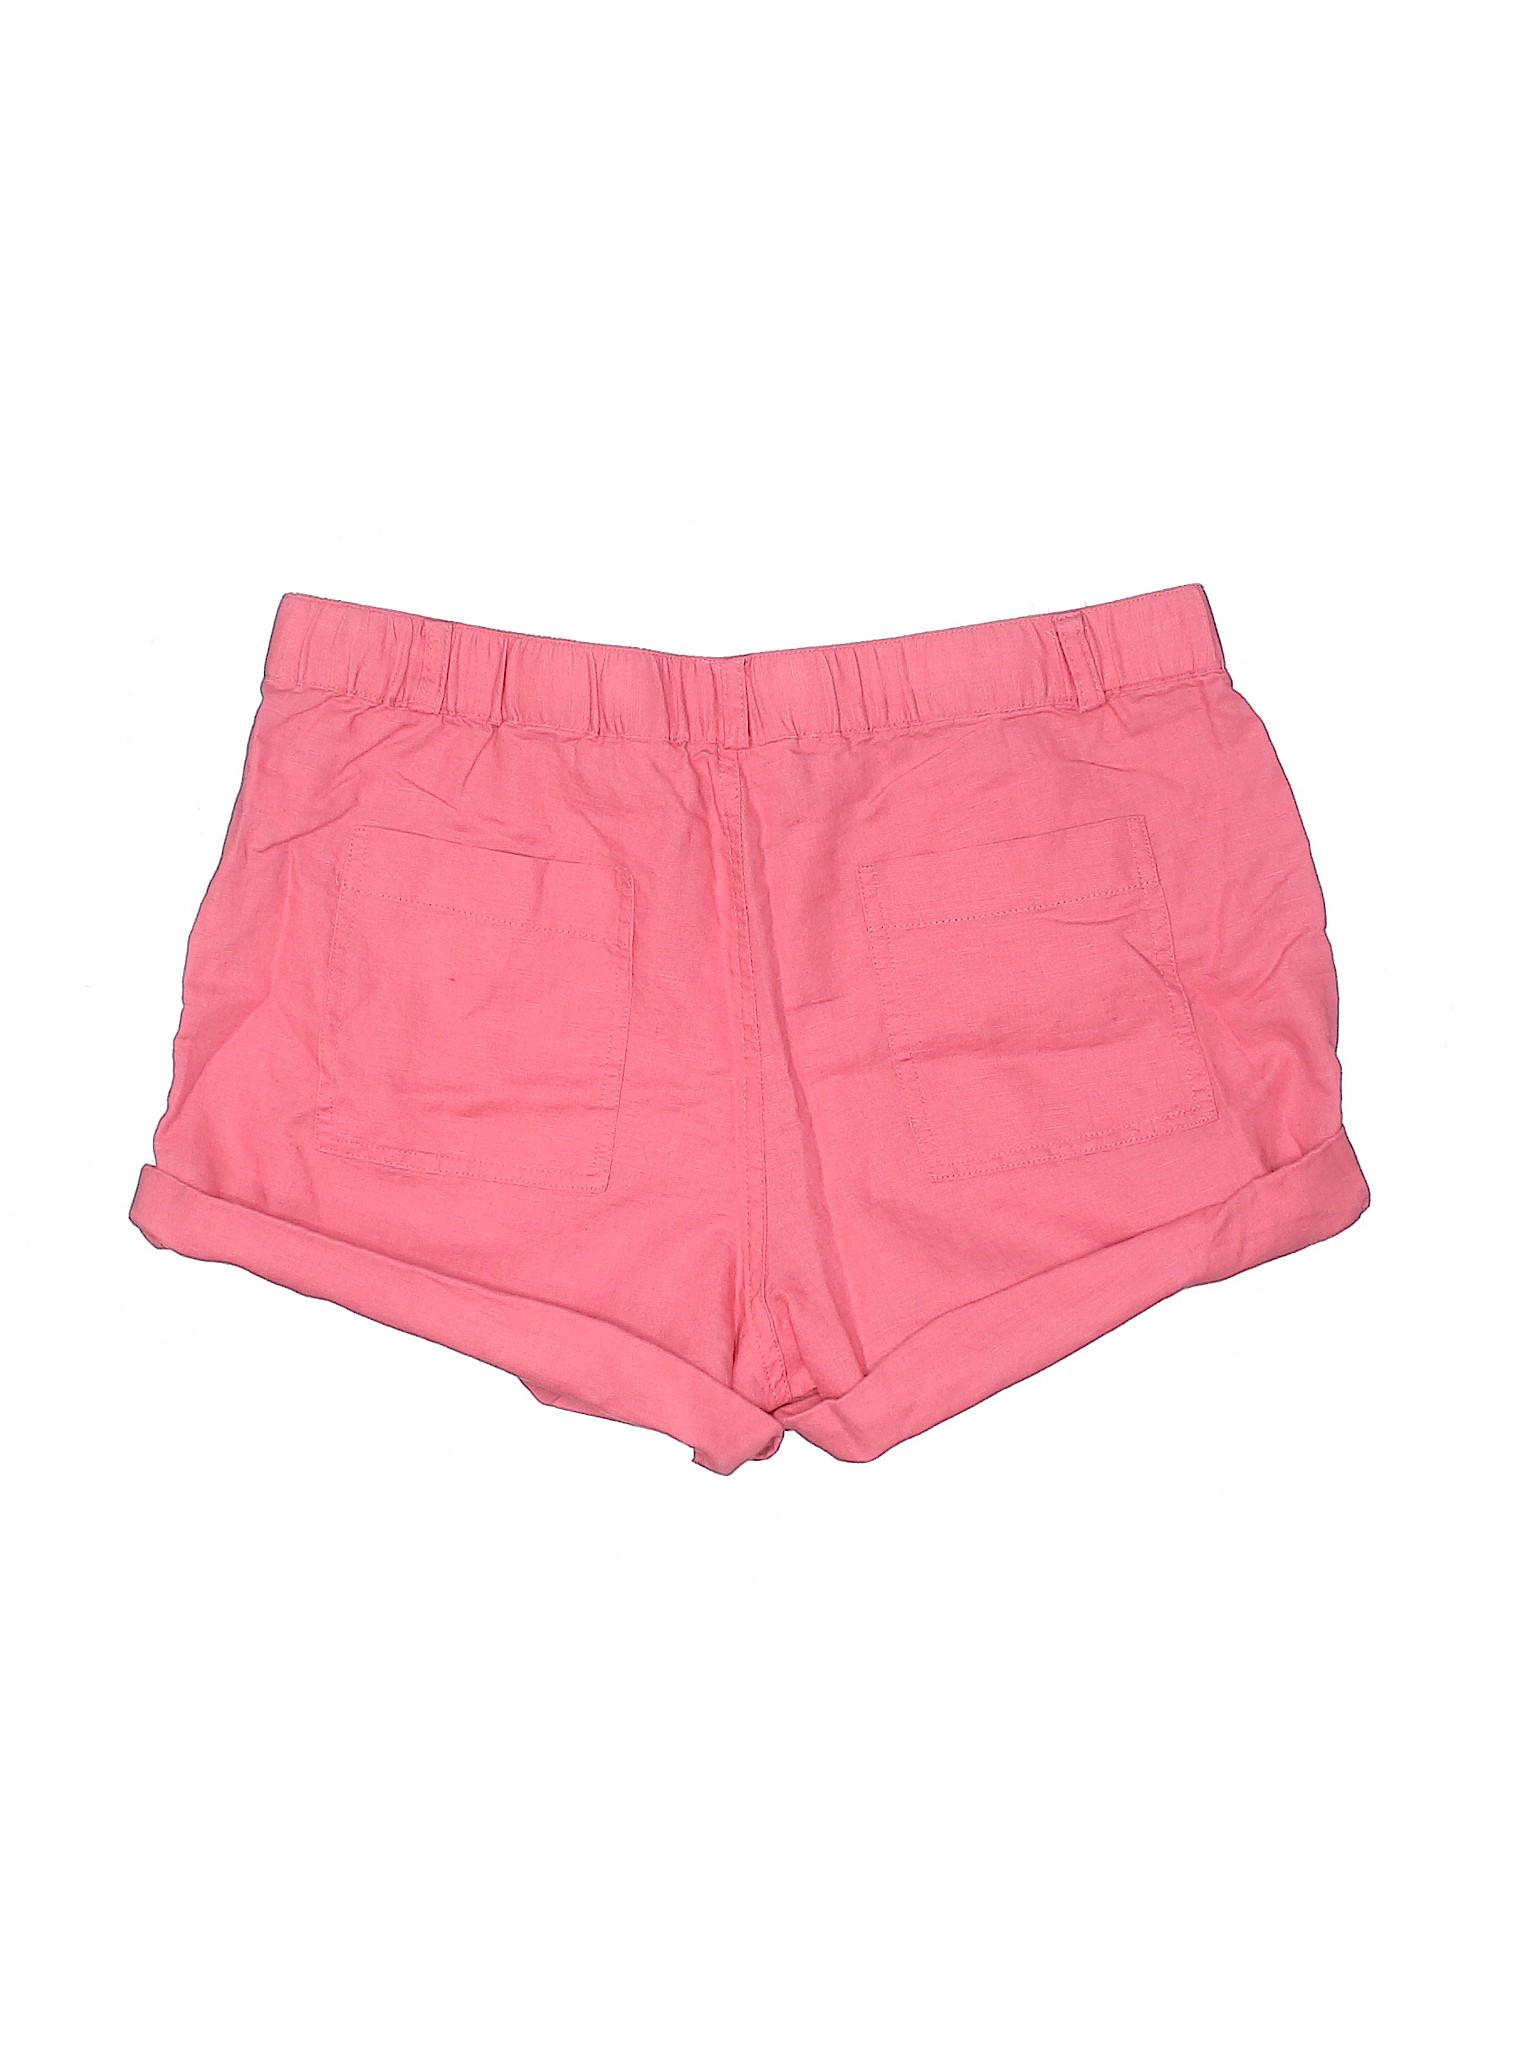 Boutique amp; Khaki York winter Company Shorts New rwqSPOxr